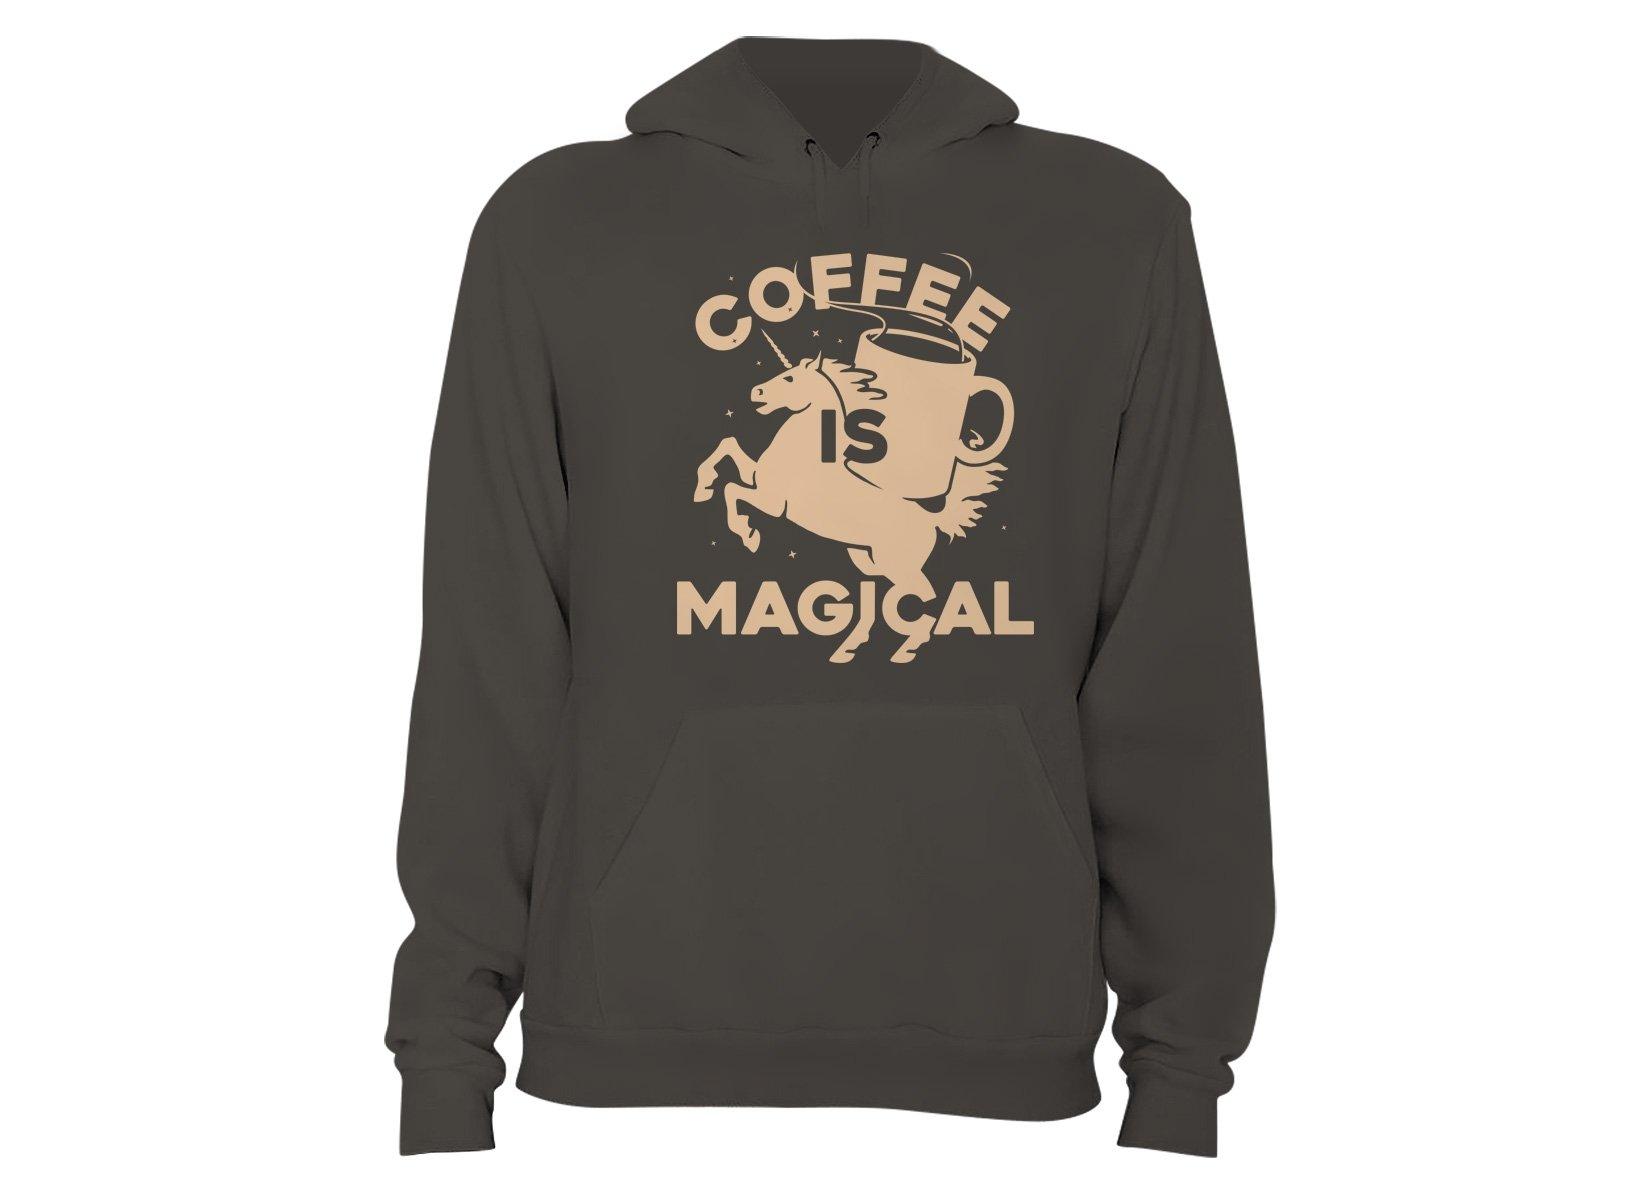 Coffee Is Magical on Hoodie